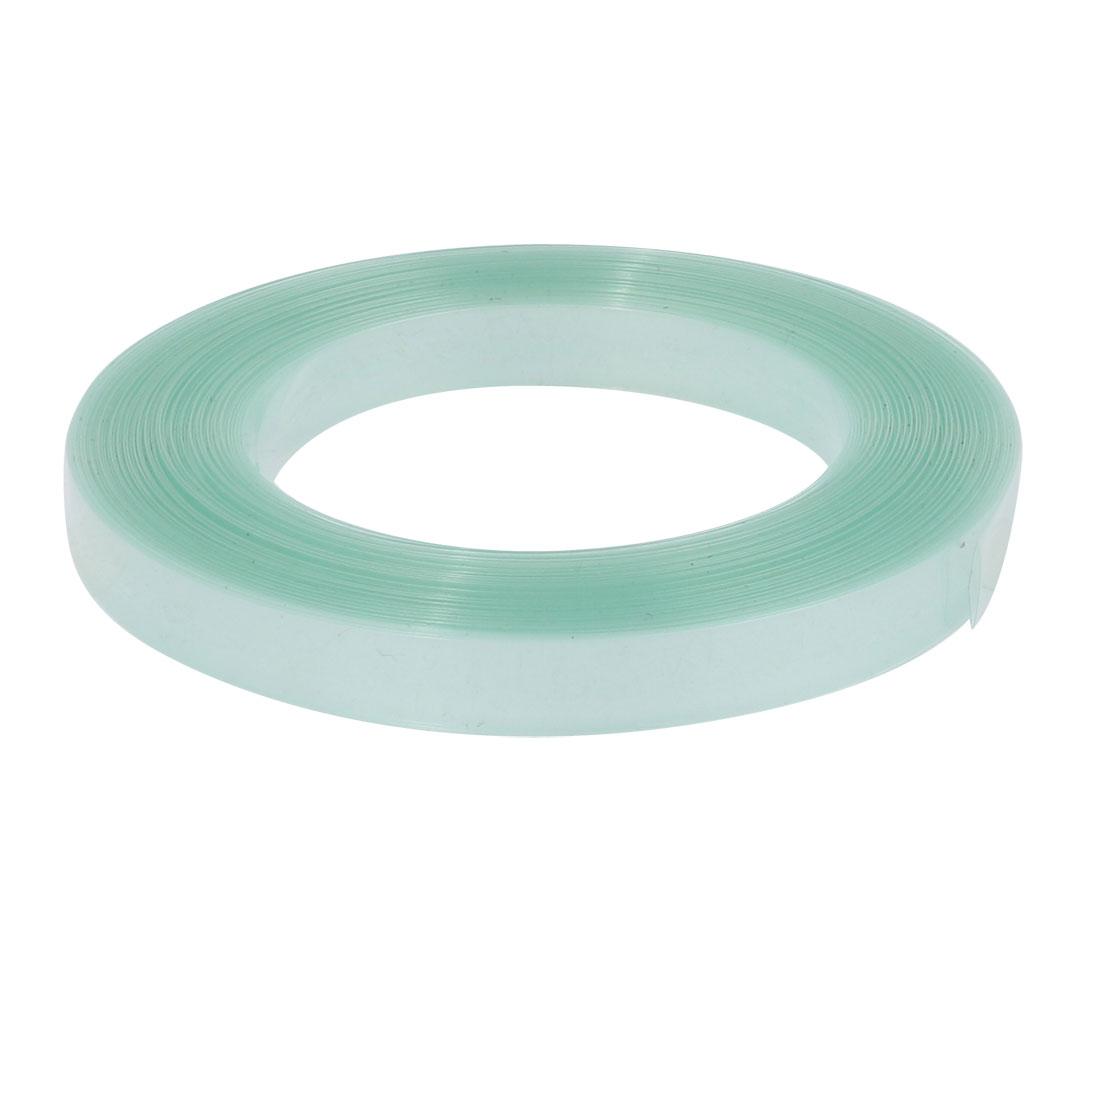 7mm Flat Width 10 Meters Long PVC Heat Shrinkable Tube Clear-green for Battery